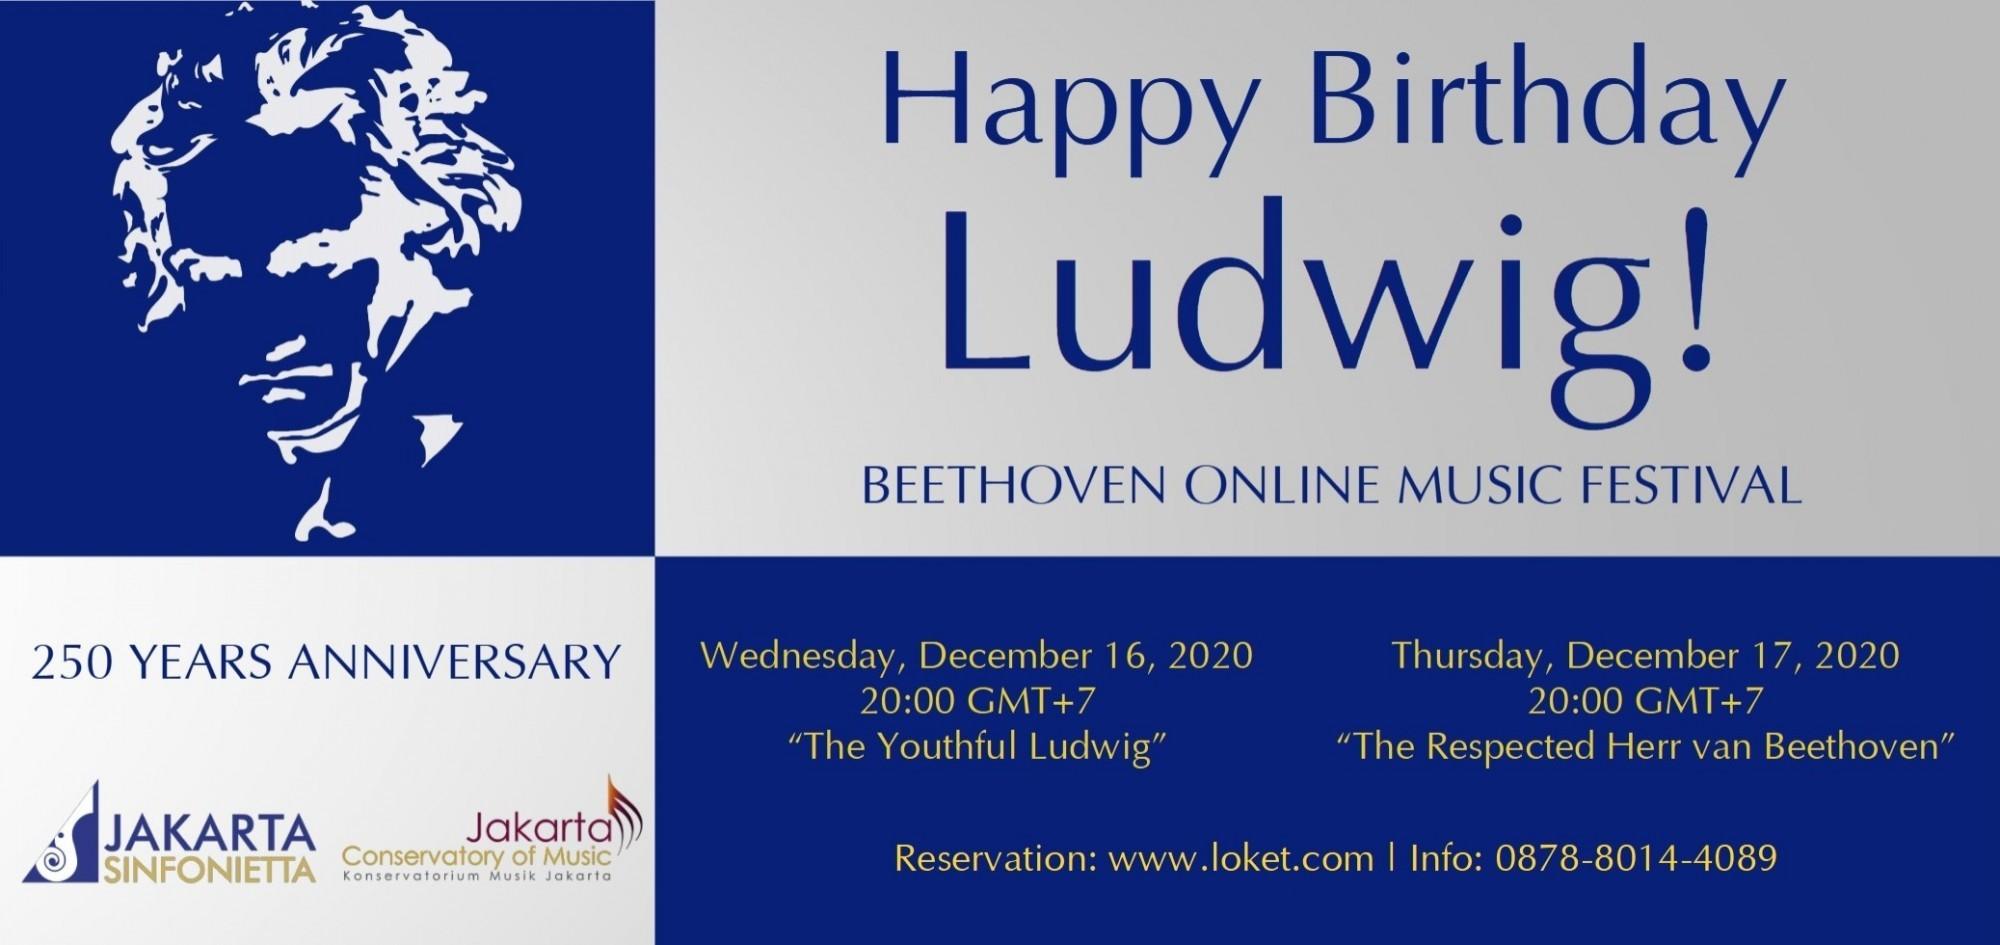 Happy Birthday Ludwig! 16 December 2020